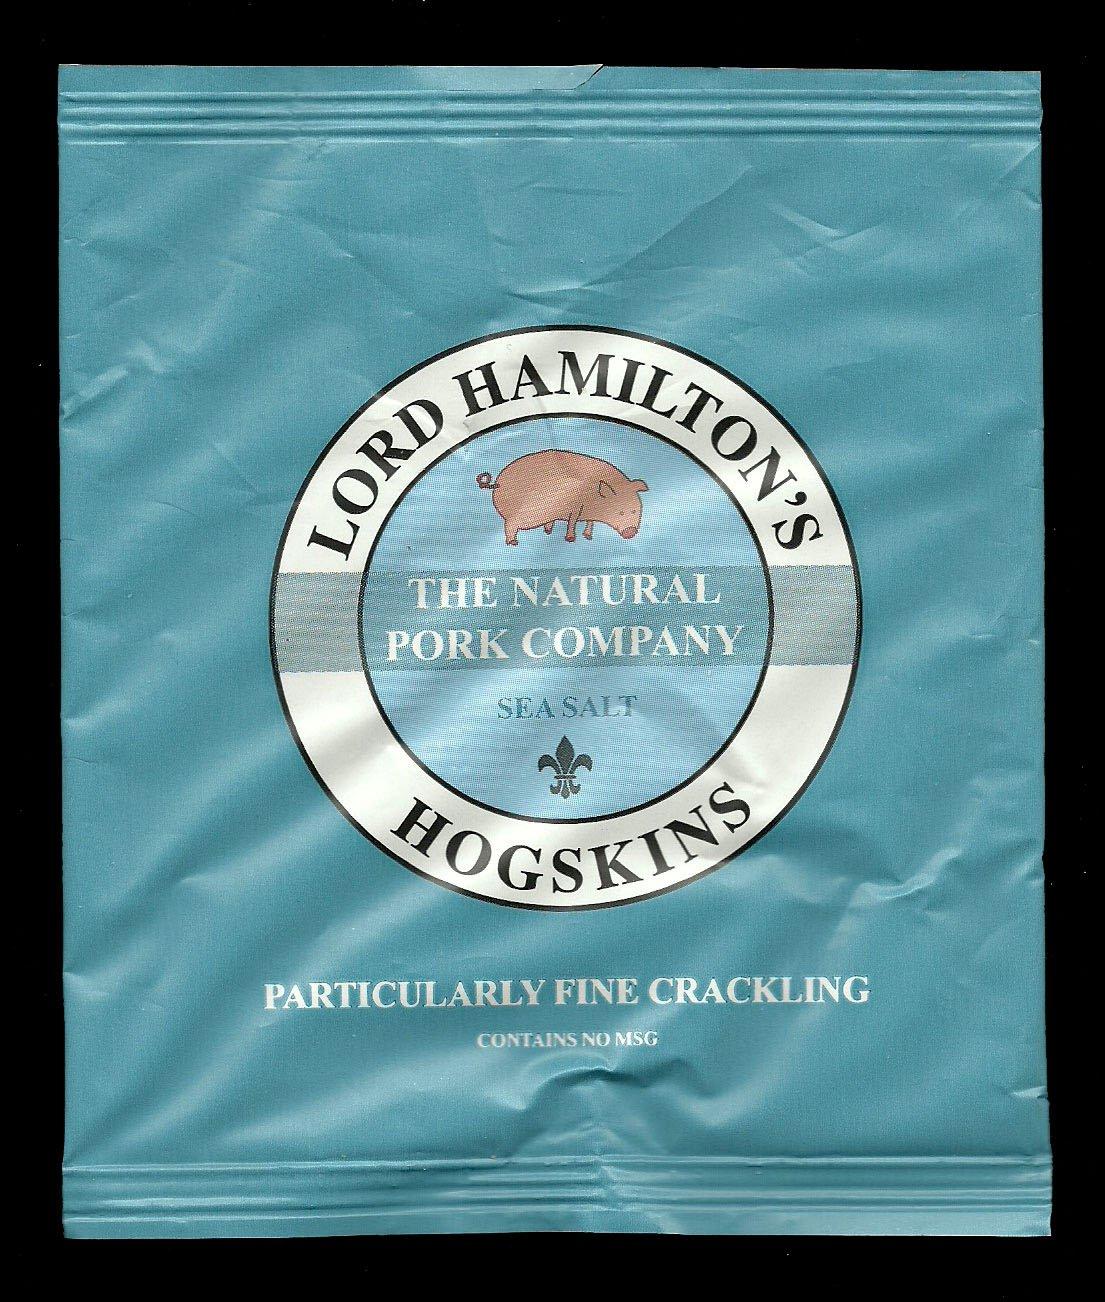 Lord Hamiltons Hogskins Sea Salt Particularly Fine Crackling Review2 - Lord Hamiltons Hogskins, Sea Salt, Particularly Fine Crackling Review